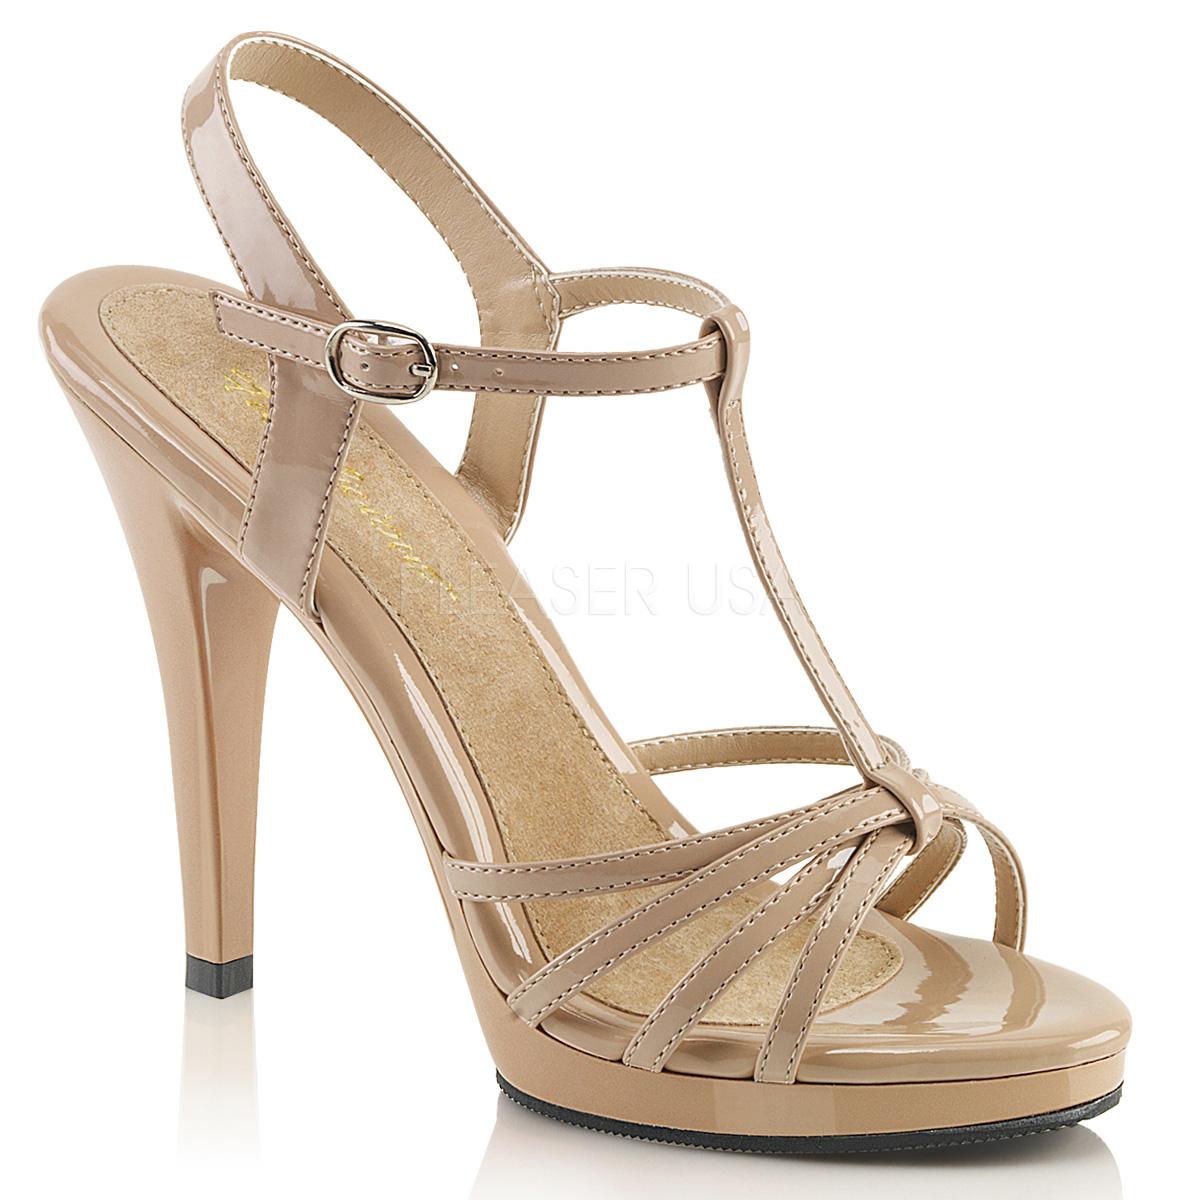 Vernice 420 Sandali Con Flair Tacco Beige Cm Donna 12 c3Aq4SR5Lj